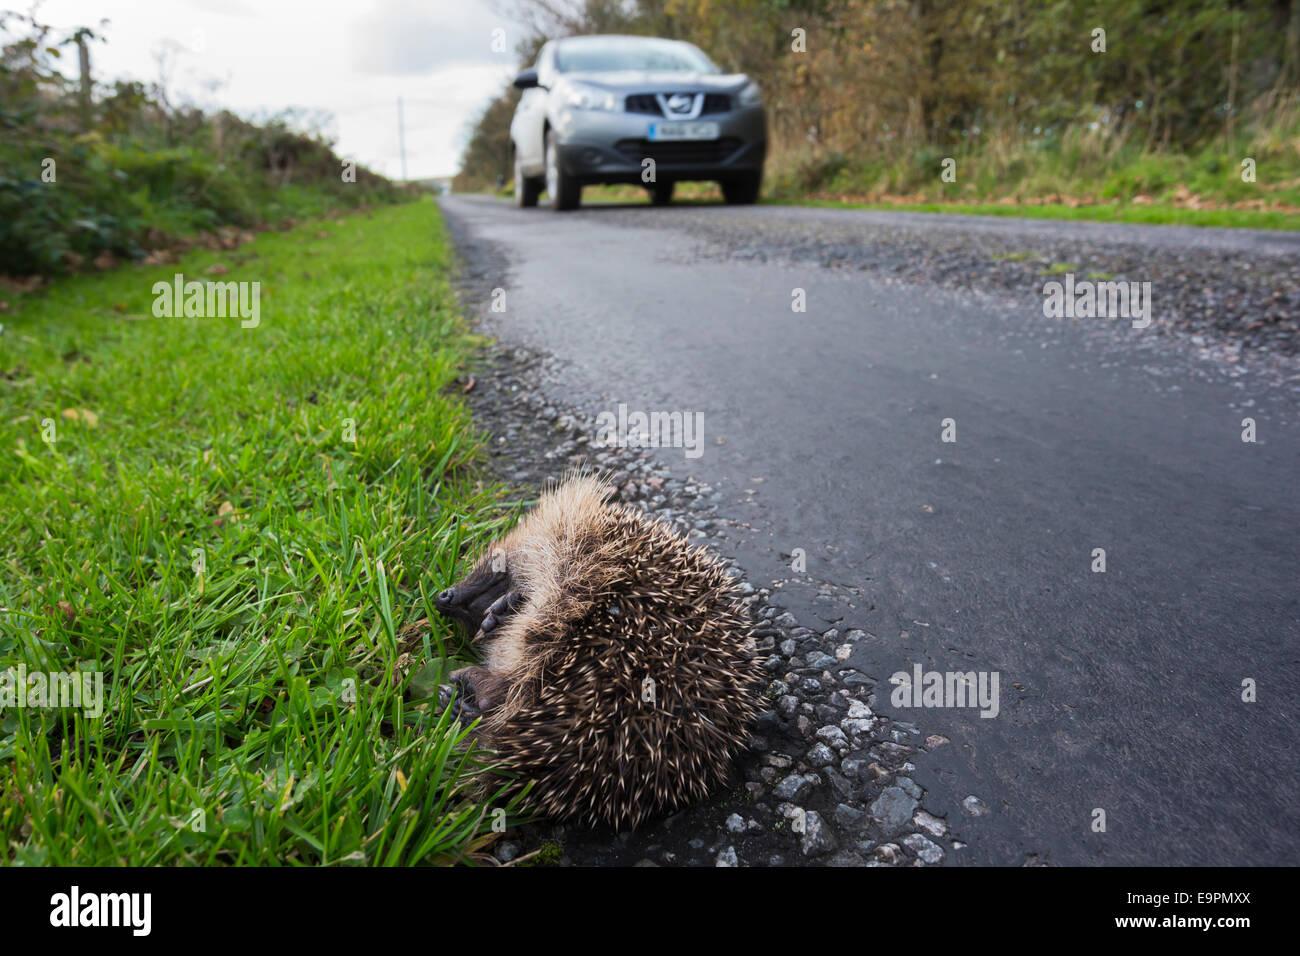 Hedgehog (Erinaceus europaeus), dead on the side of the road, UK, Islay, Scotland - Stock Image